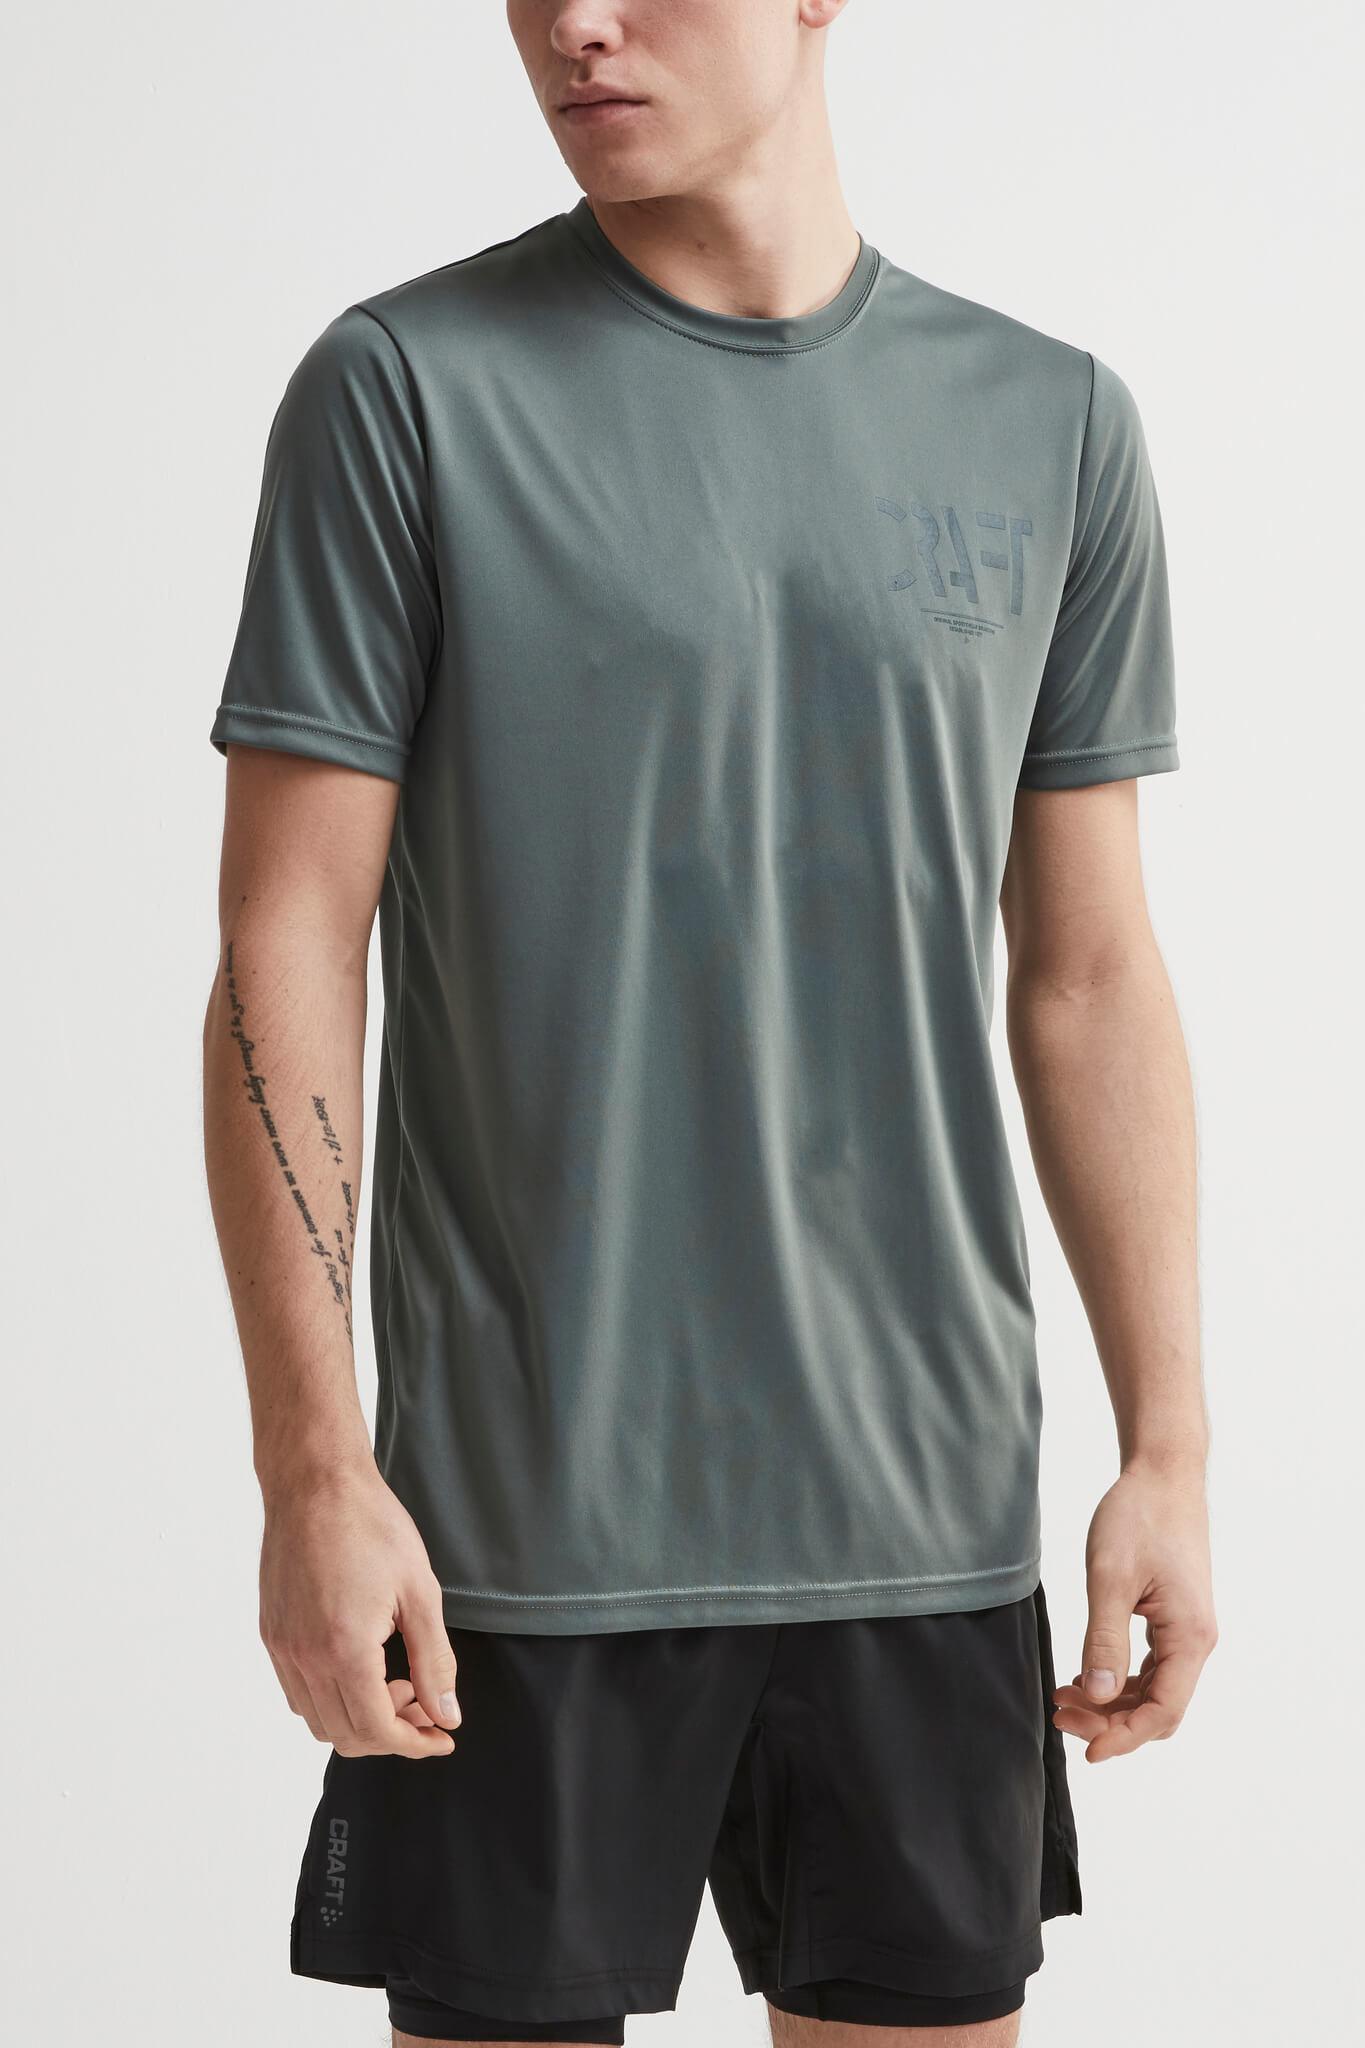 Craft Eaze SS Graghic футболка спортивная мужская - 2